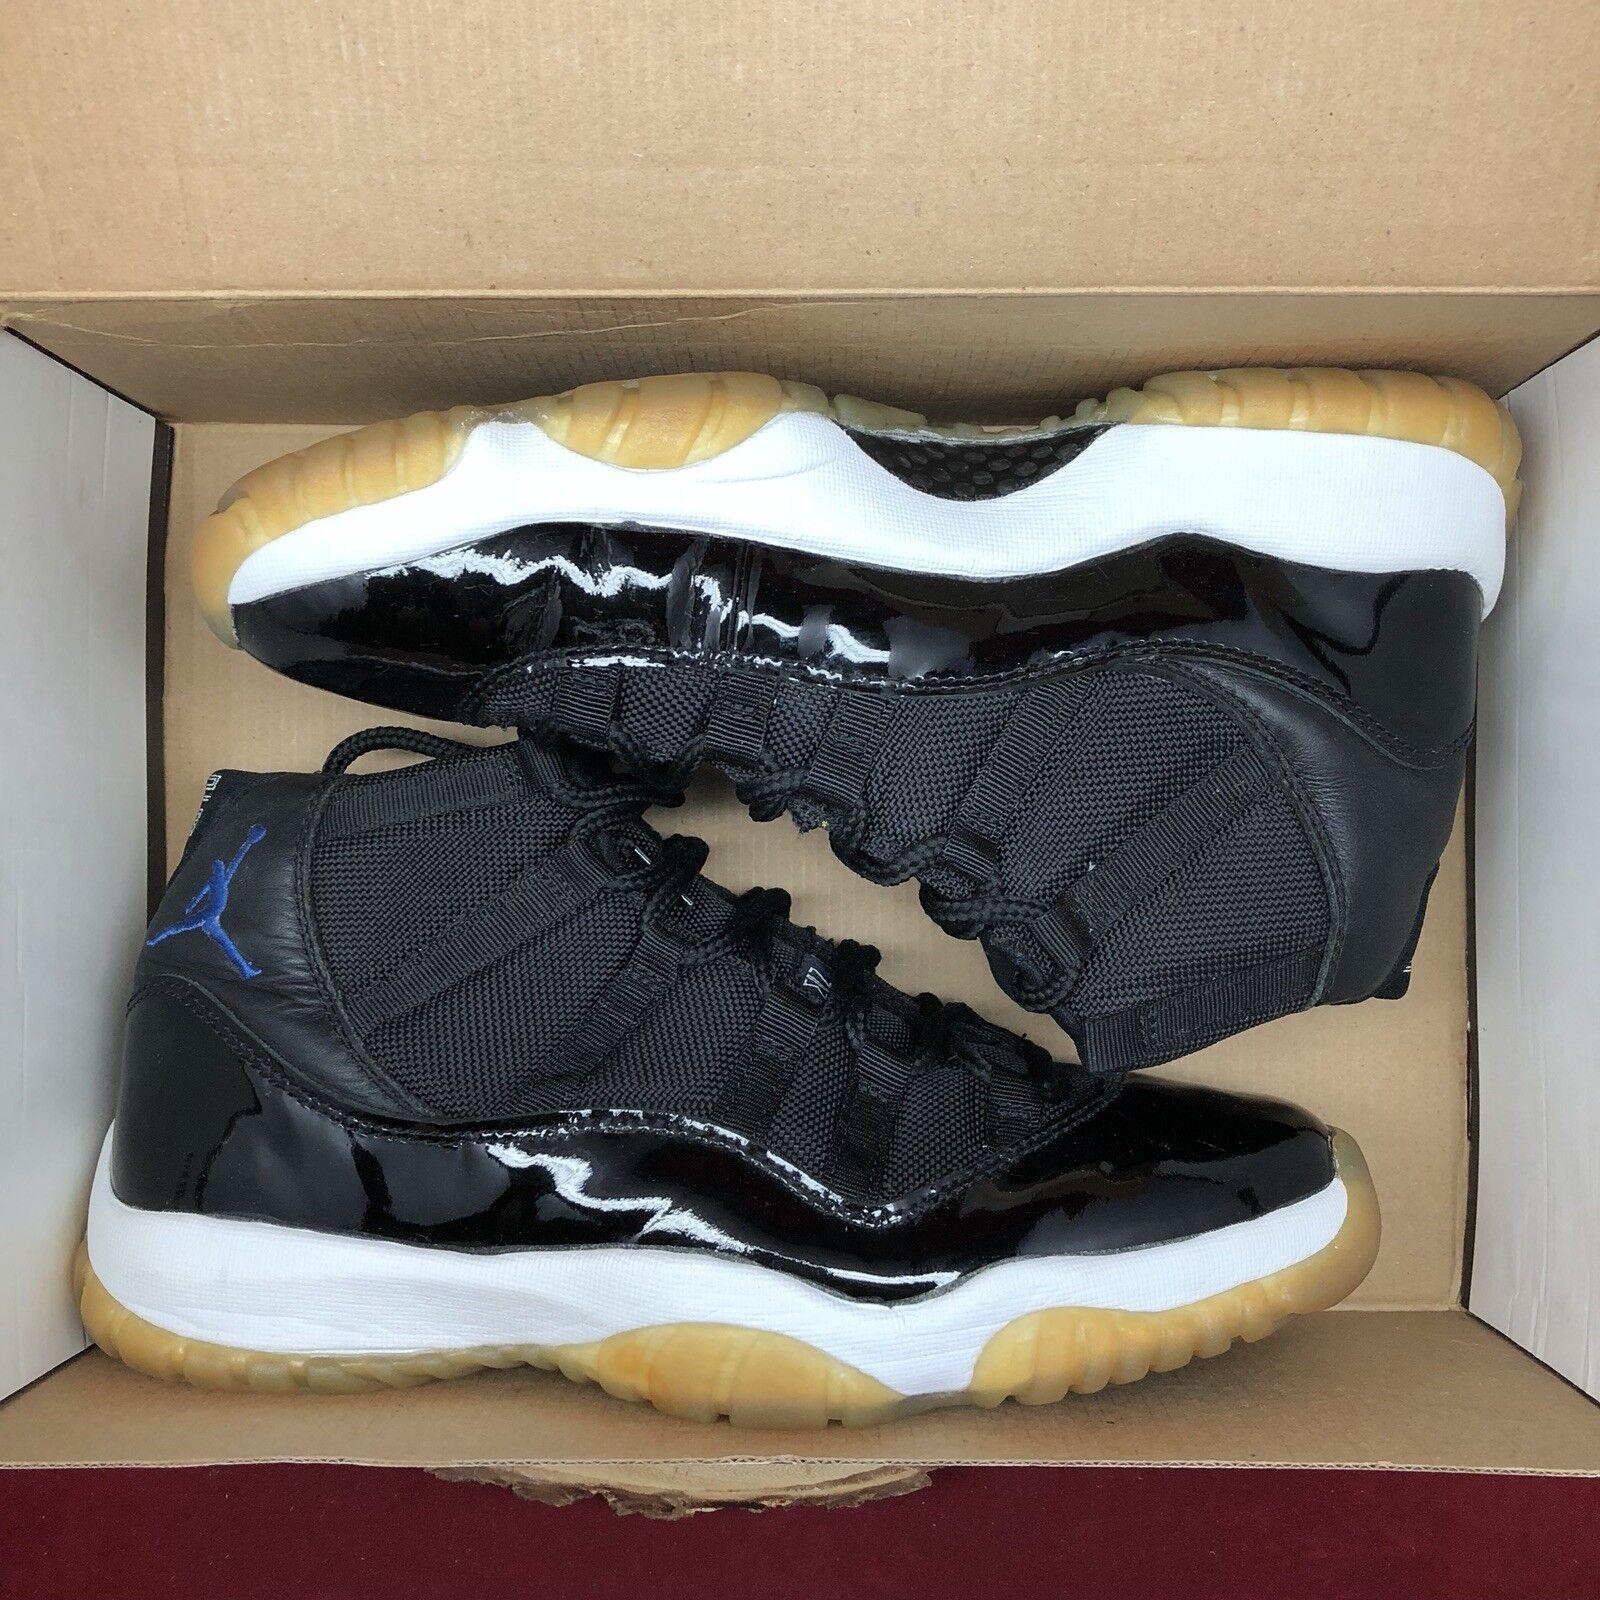 2000 Nike Air Jordan Retro XI Space Jam Black Size 10 136046 041 Concord XII IX